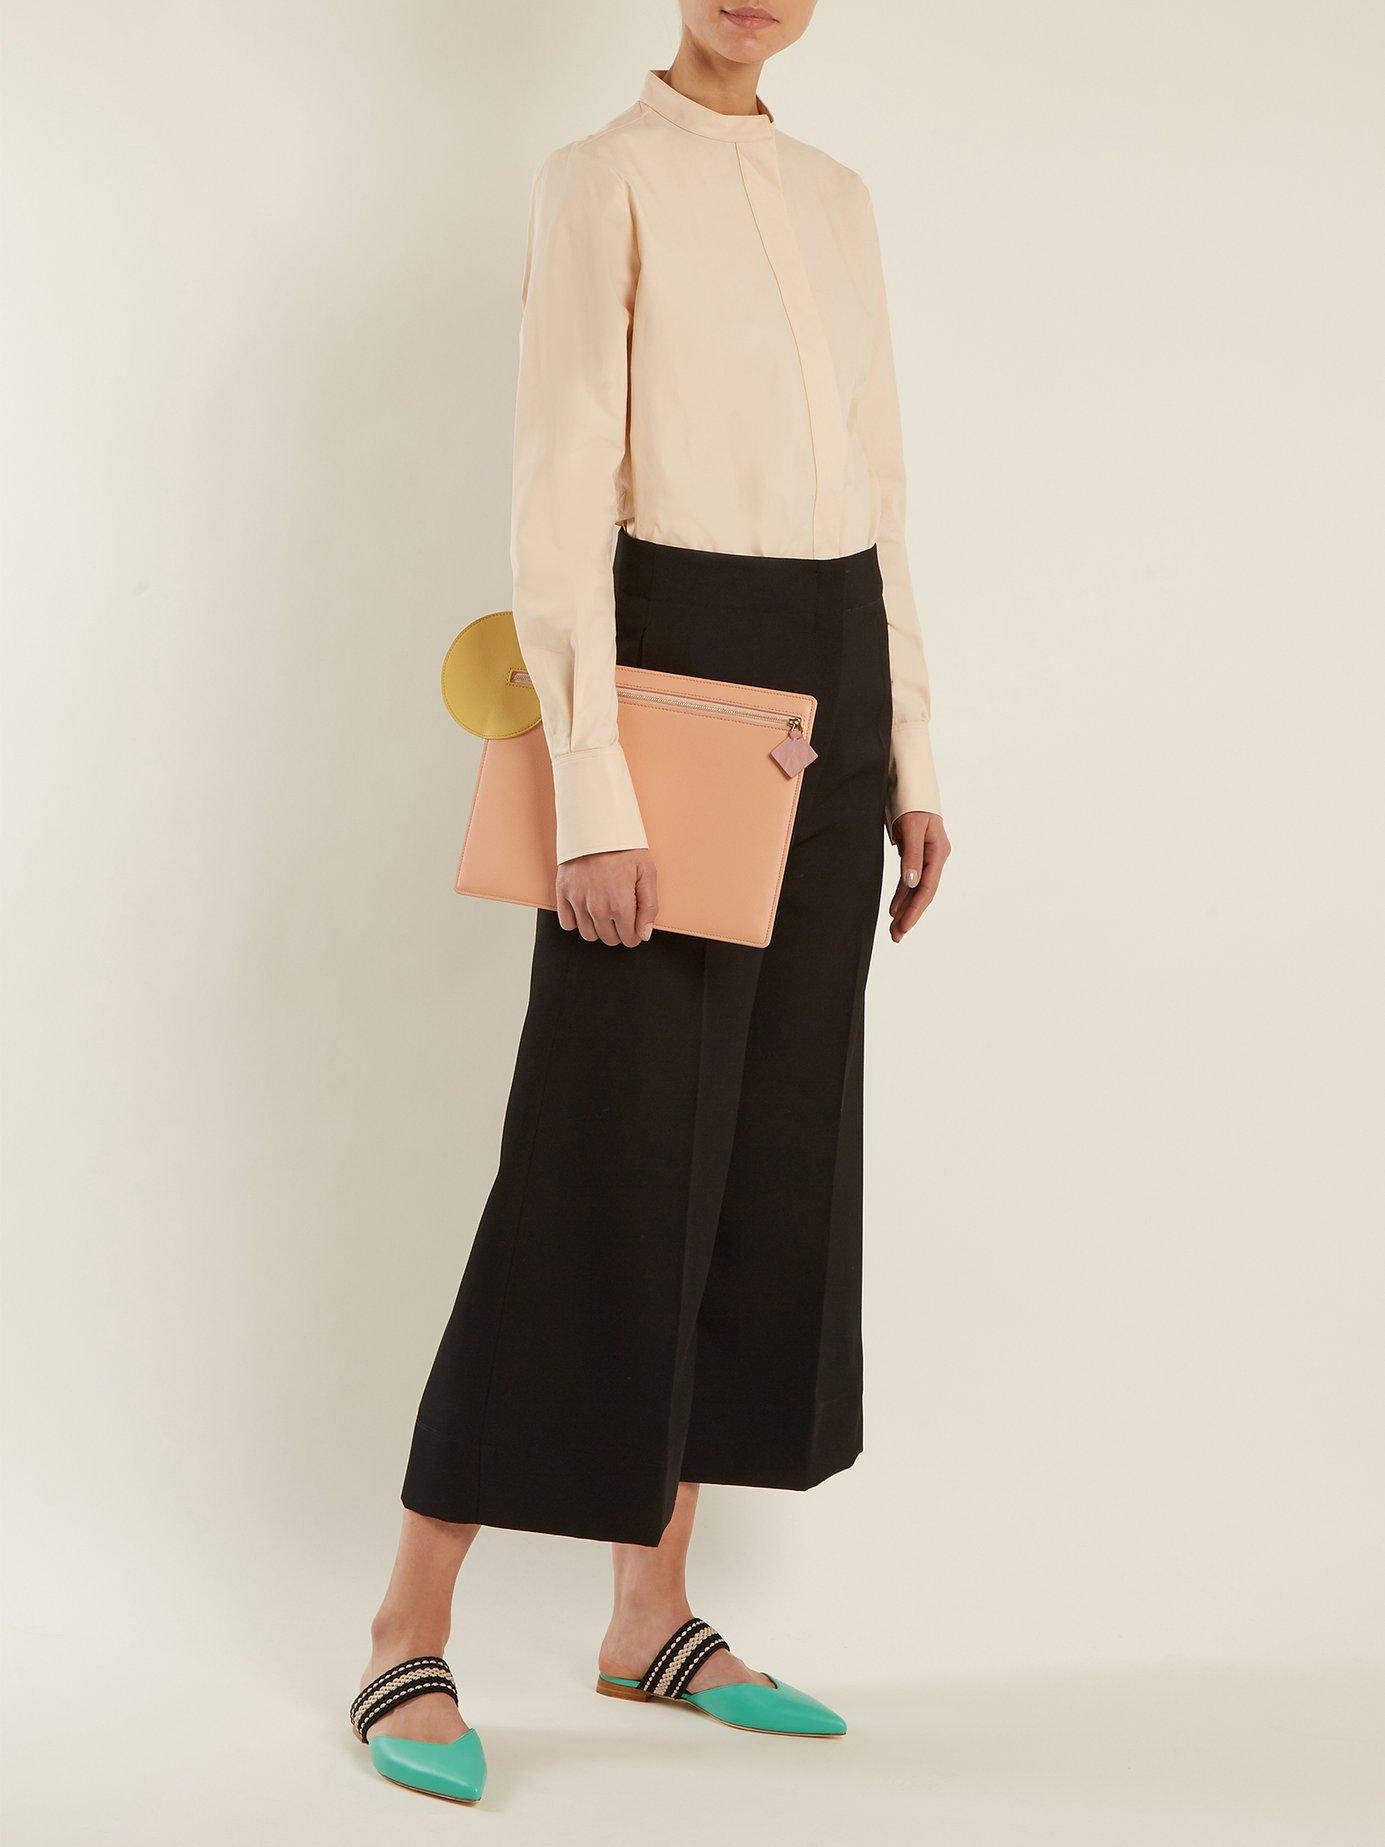 X Roksanda Hannah leather backless flats by Malone Souliers